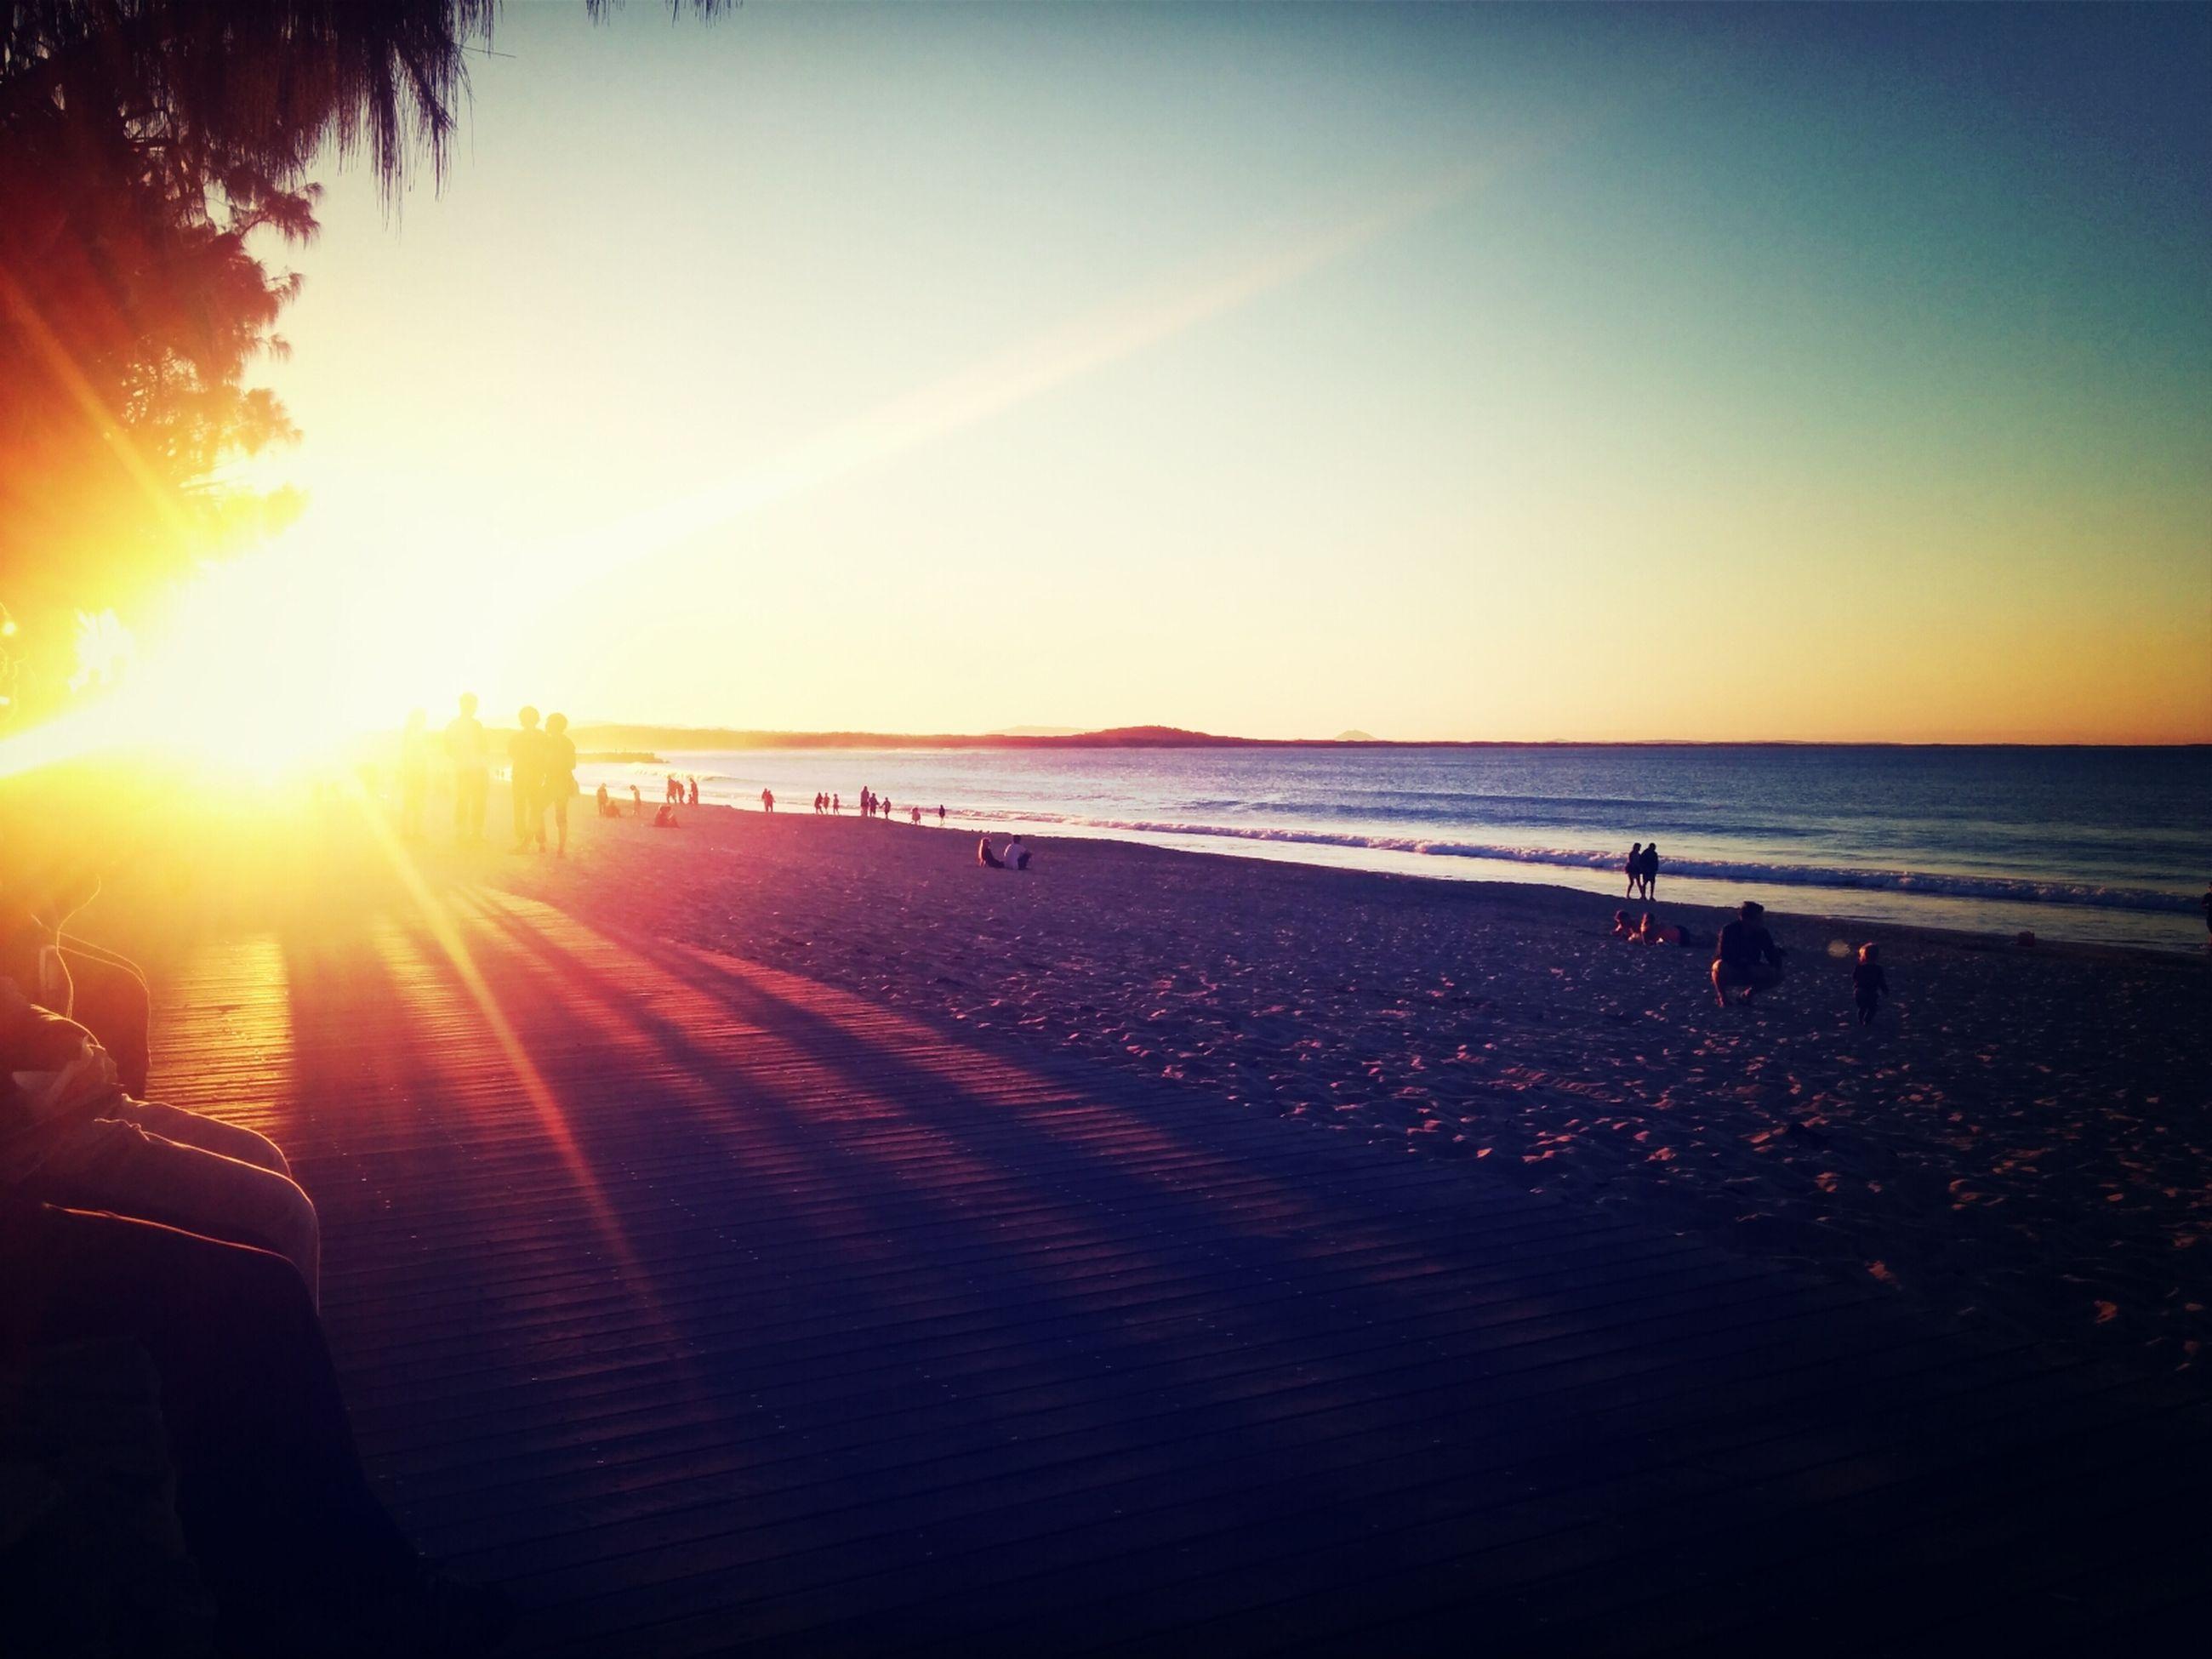 sun, sea, sunset, horizon over water, beach, water, sunlight, sunbeam, scenics, shore, beauty in nature, tranquil scene, lens flare, tranquility, sand, sky, orange color, nature, clear sky, idyllic